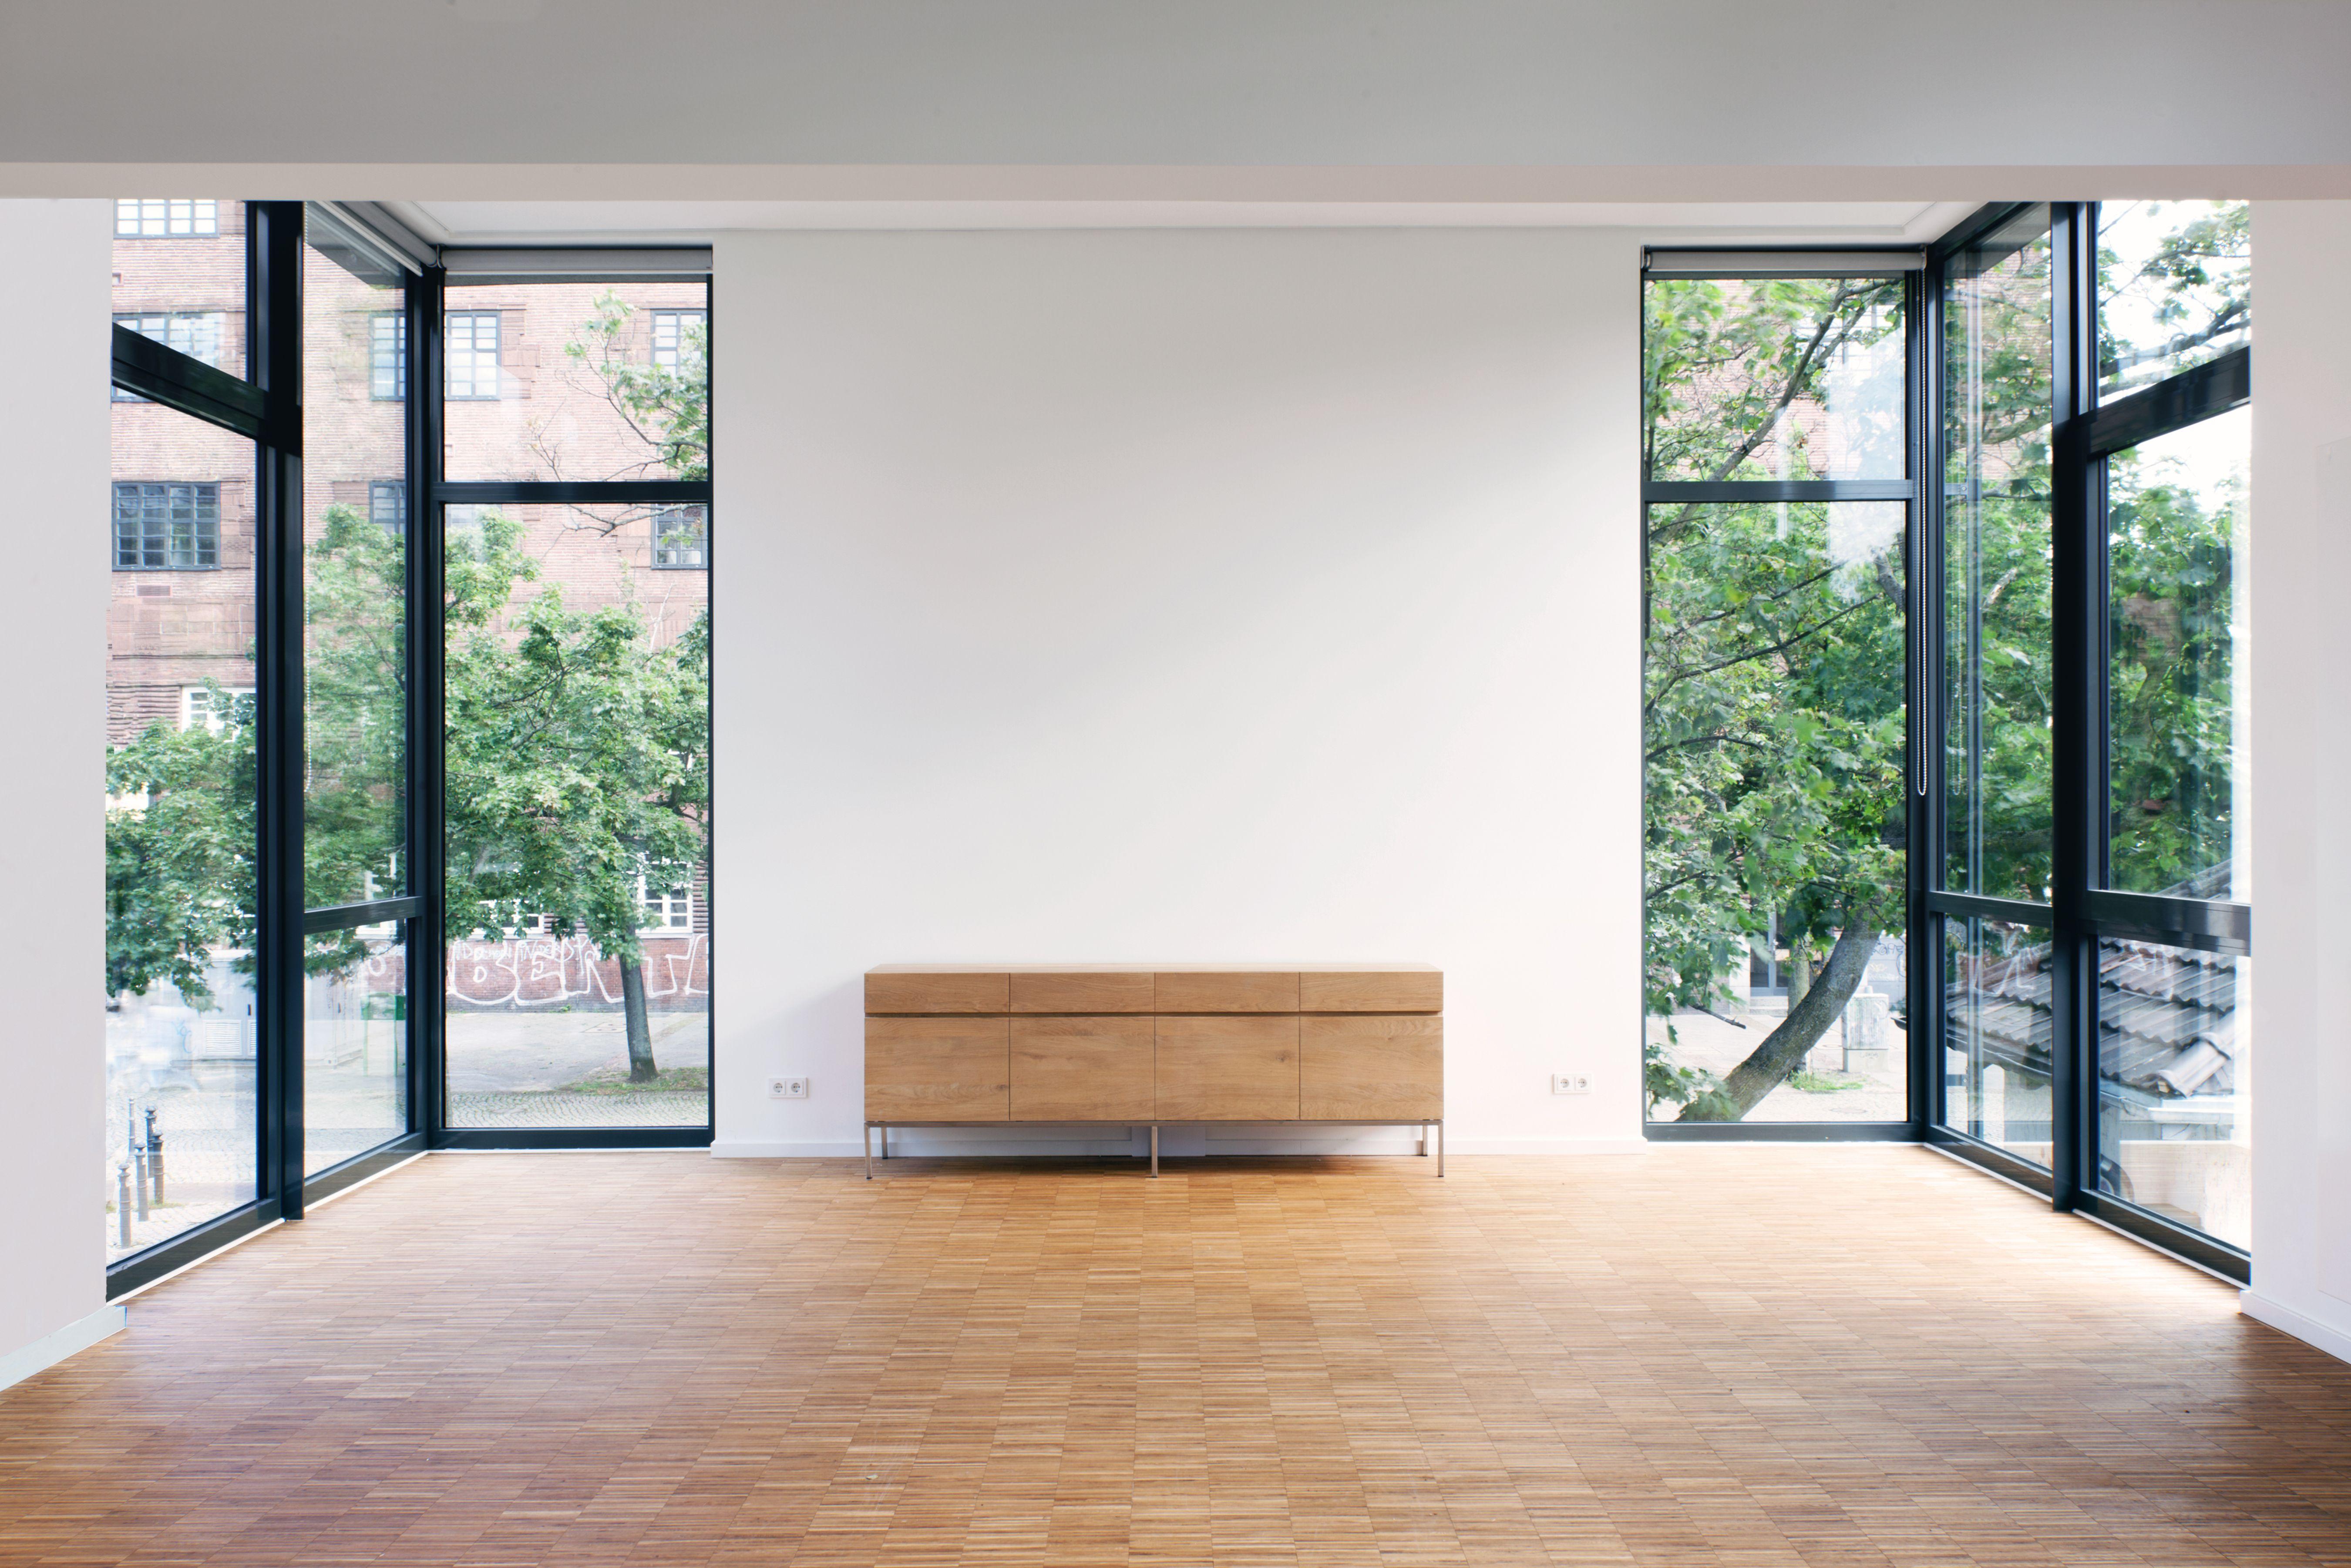 Workshop space in Residency House for GoetheInstitut at SilentGreen Kulturquartier Berlin Design by Max Dengler Architekten  KOMBINATIV Photo by Peter Lorenz